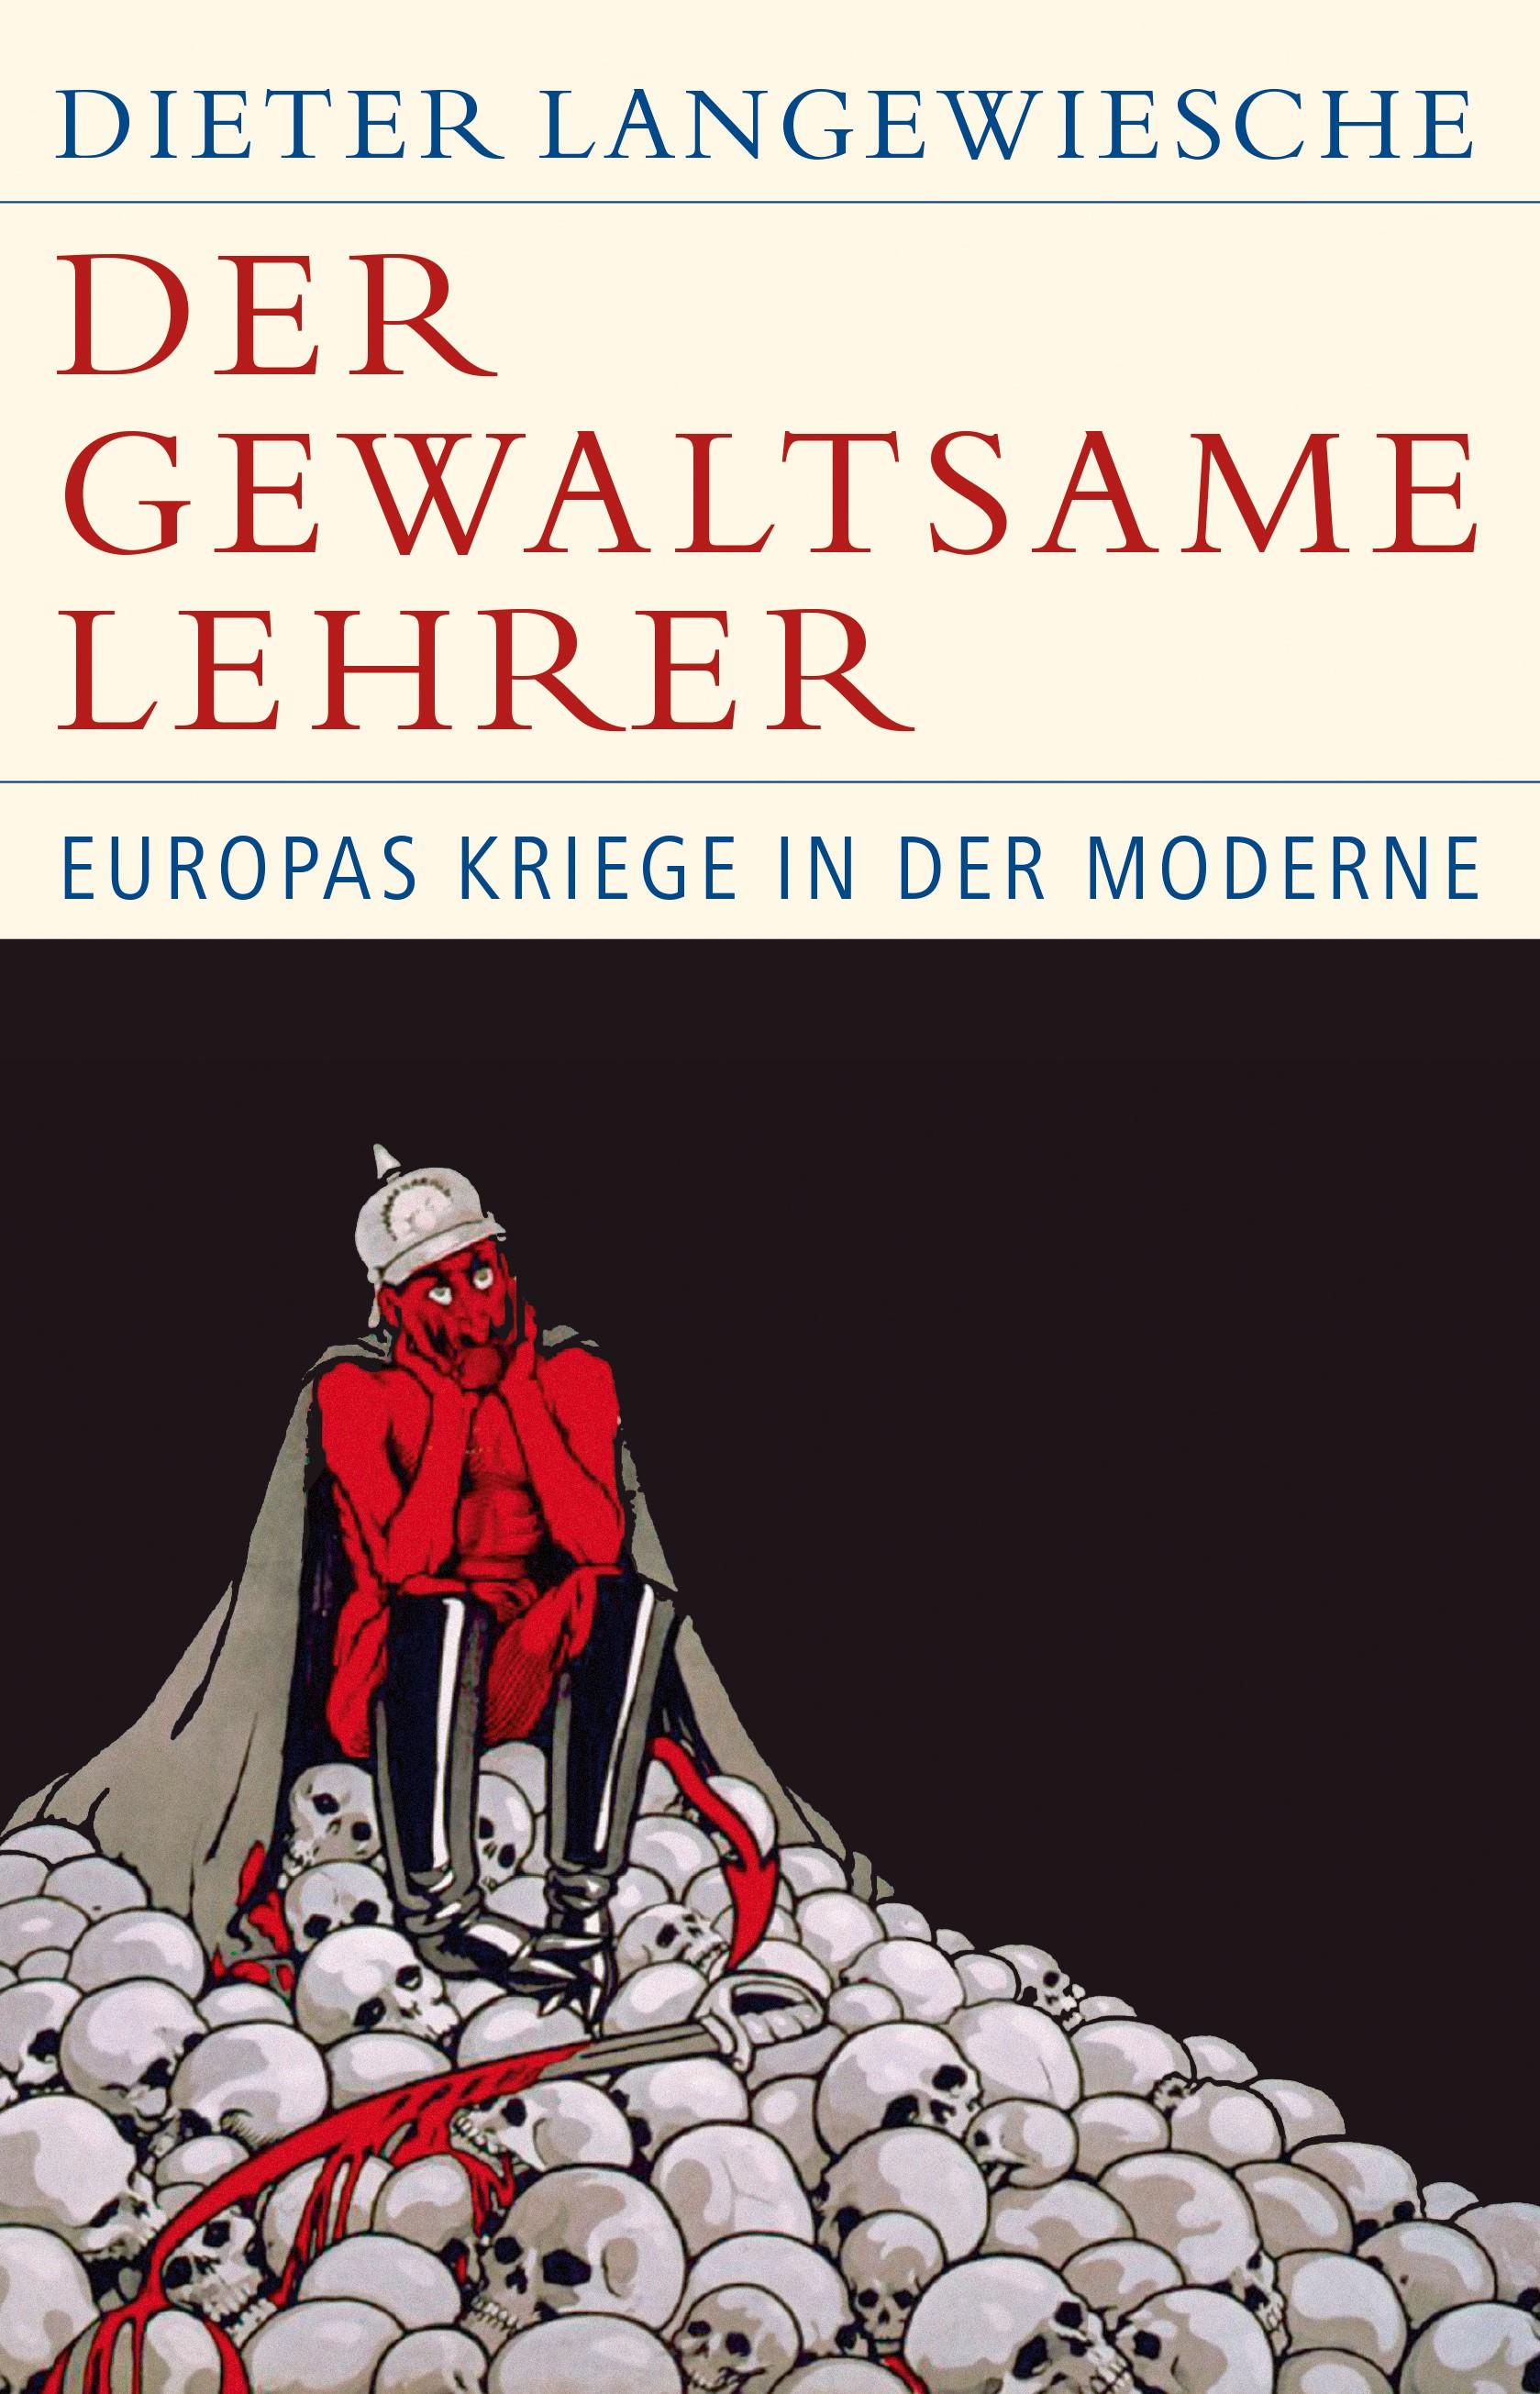 Der gewaltsame Lehrer | Langewiesche, Dieter, 2019 | Buch (Cover)